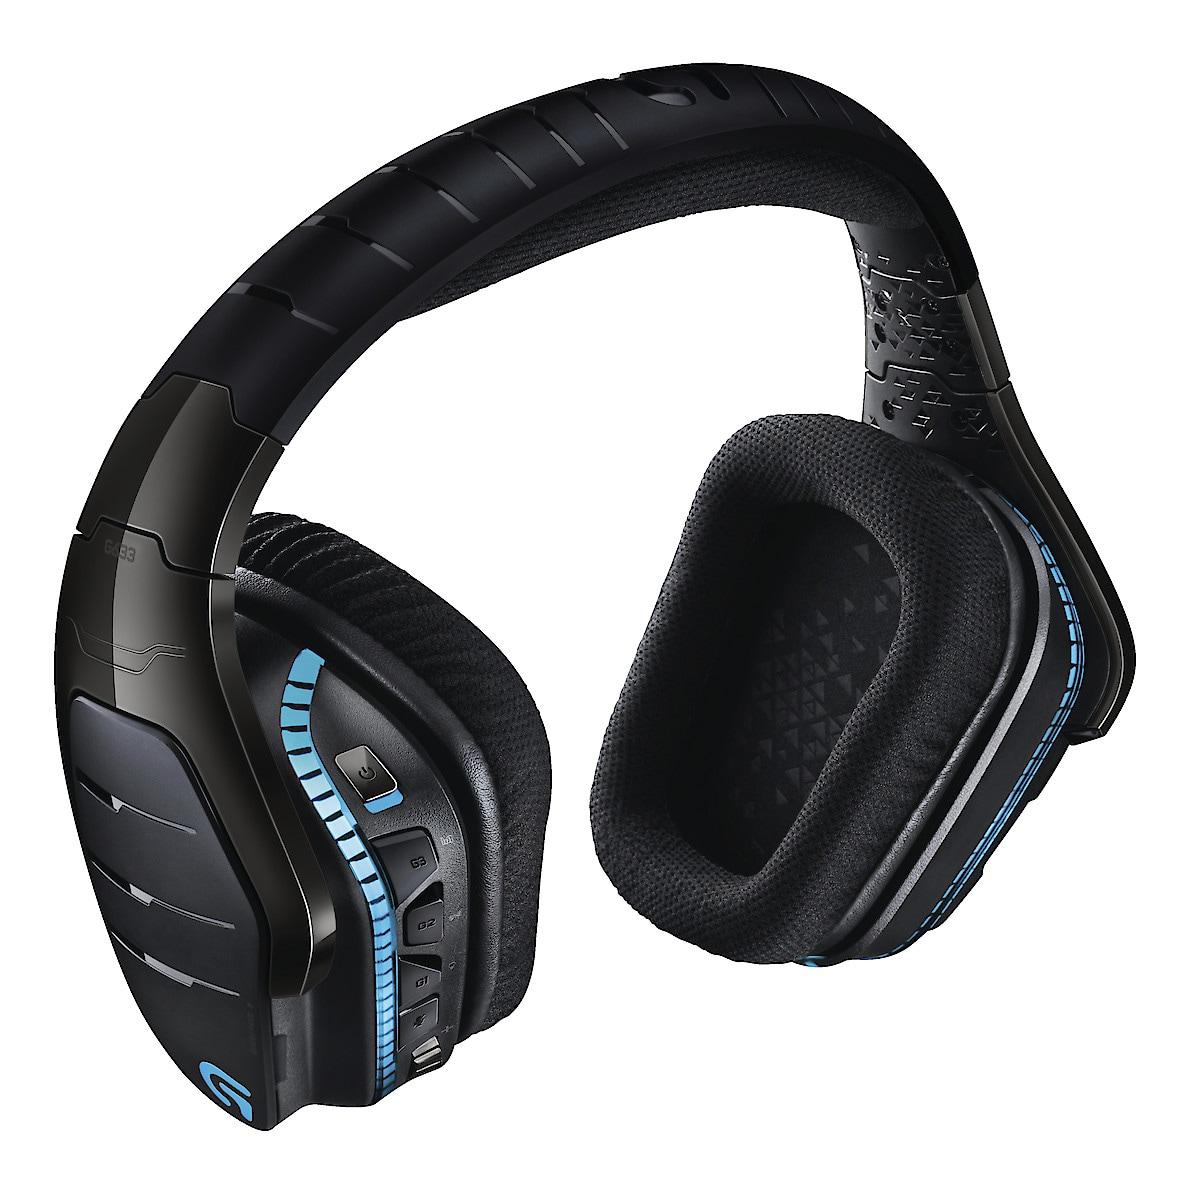 Headset gaming USB Logitech G633 Artemis Spectrum